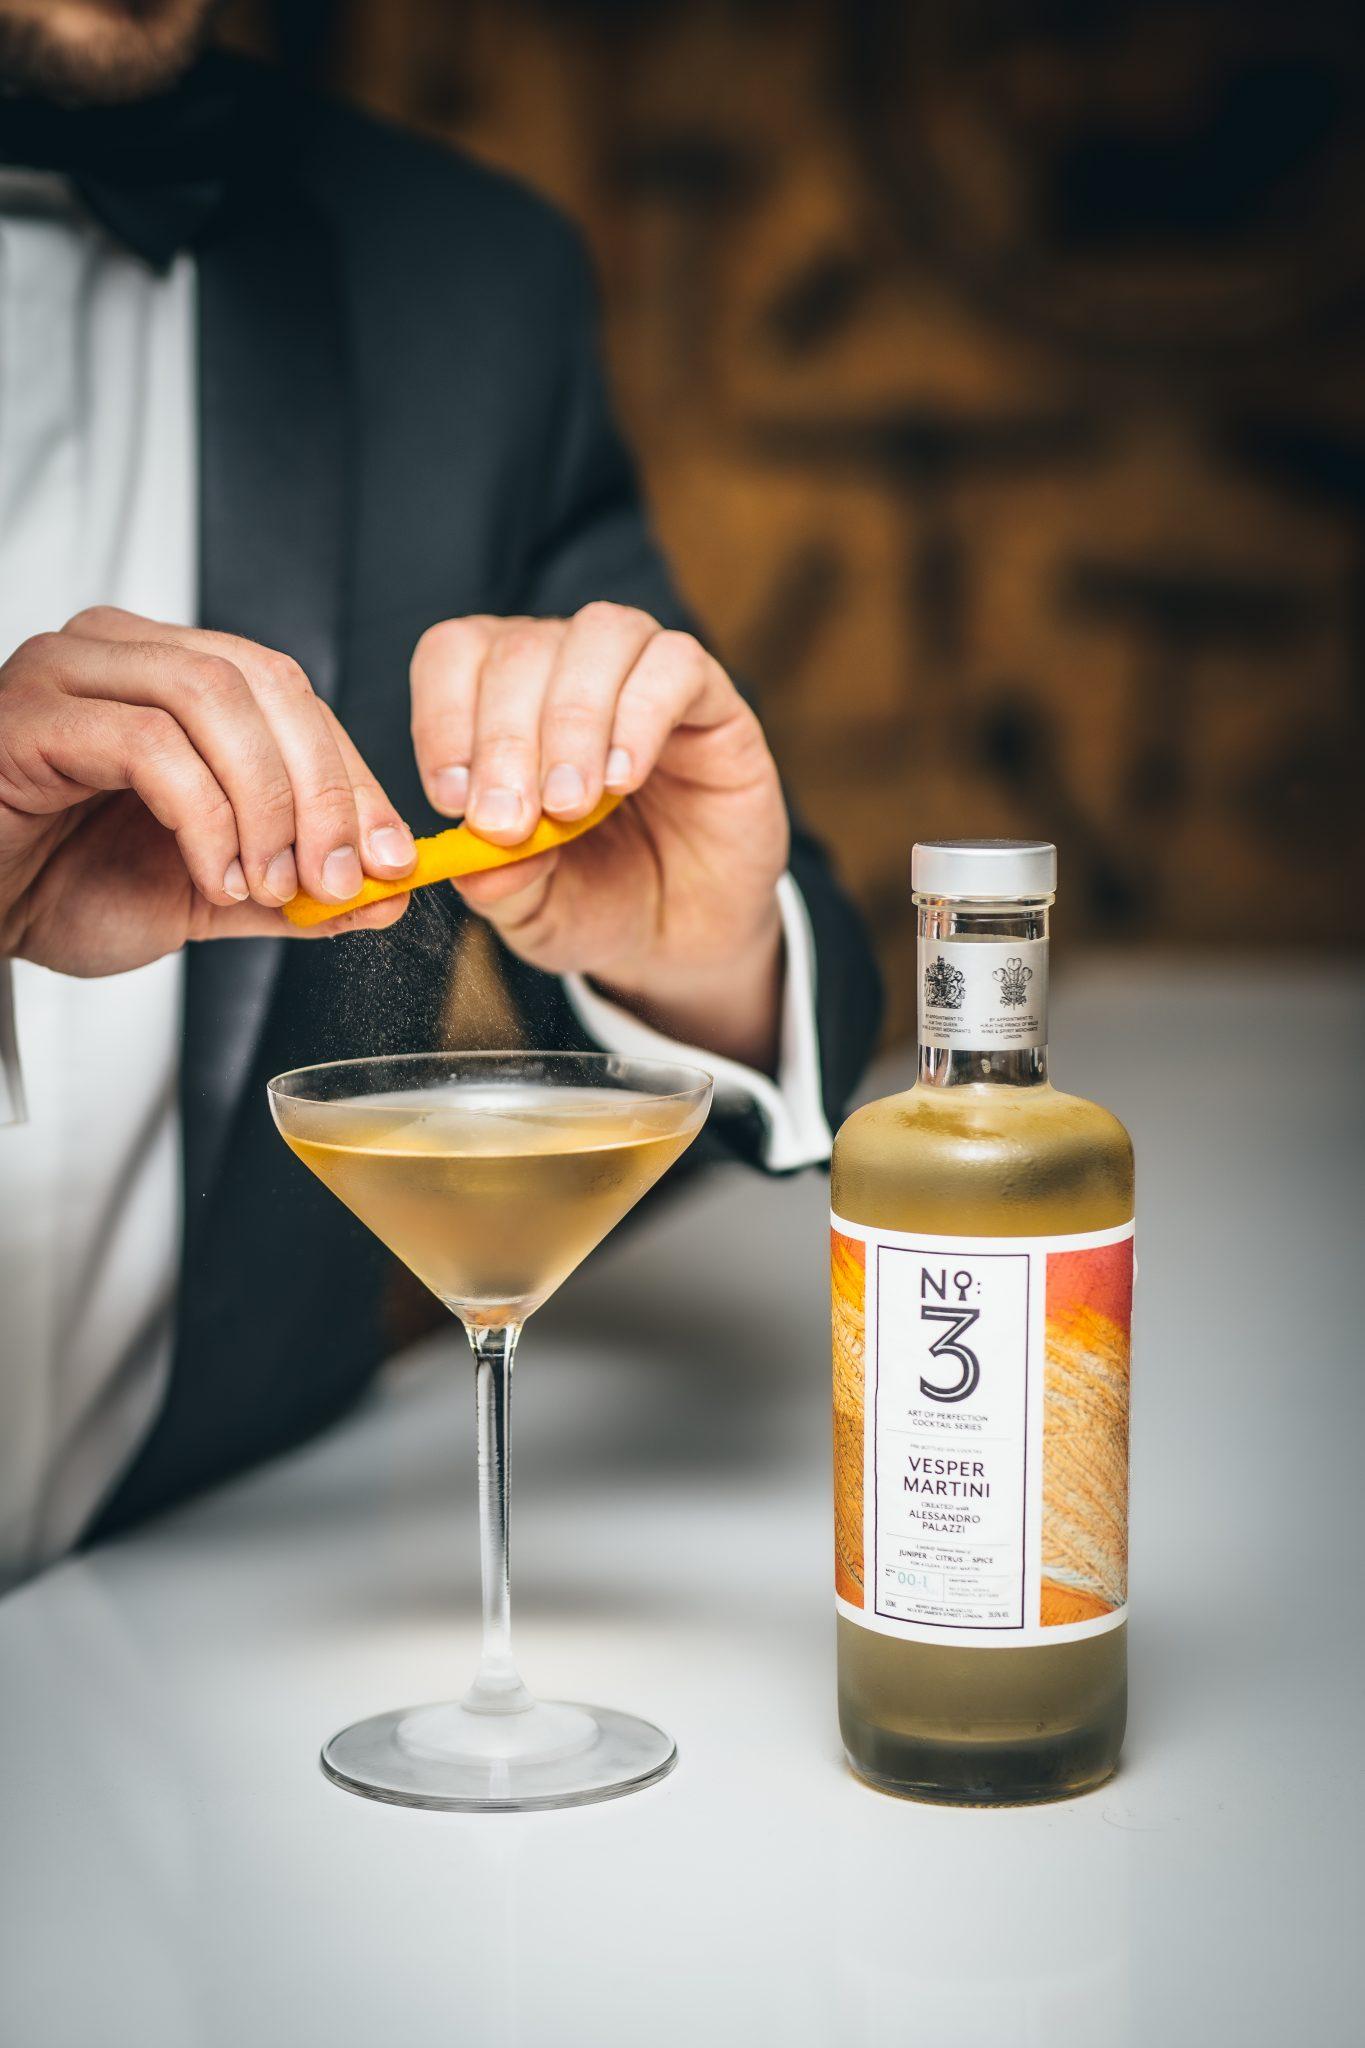 No.3 Gin Vesper Martini DUKES portrait| Photo: @lateef.photography